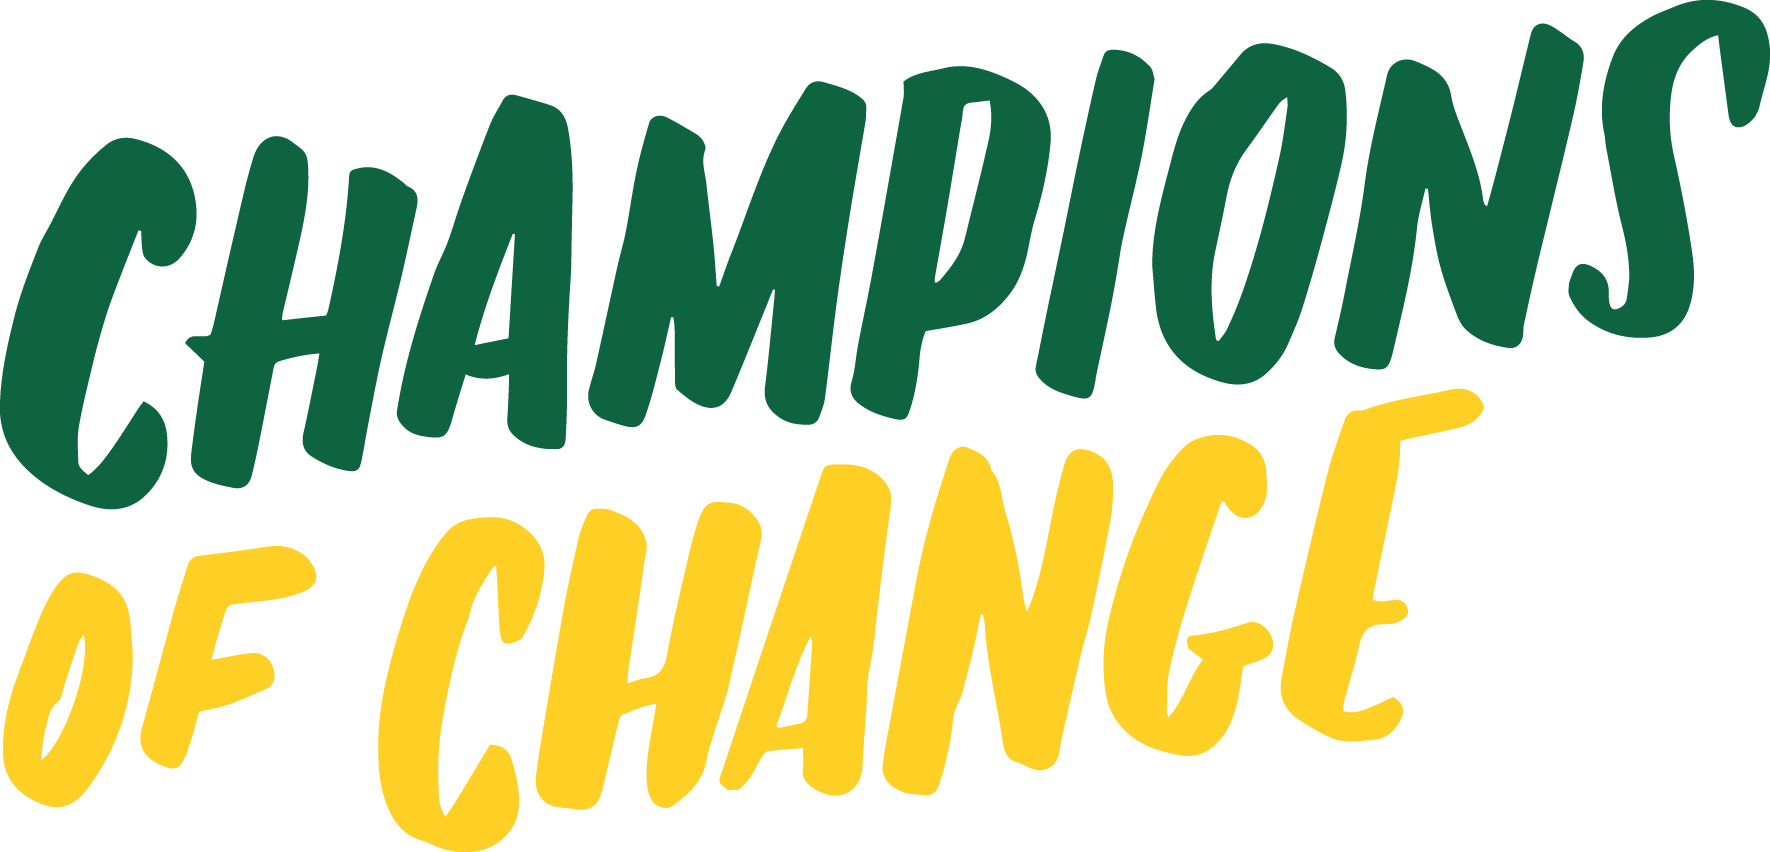 logo-champions-lloyds